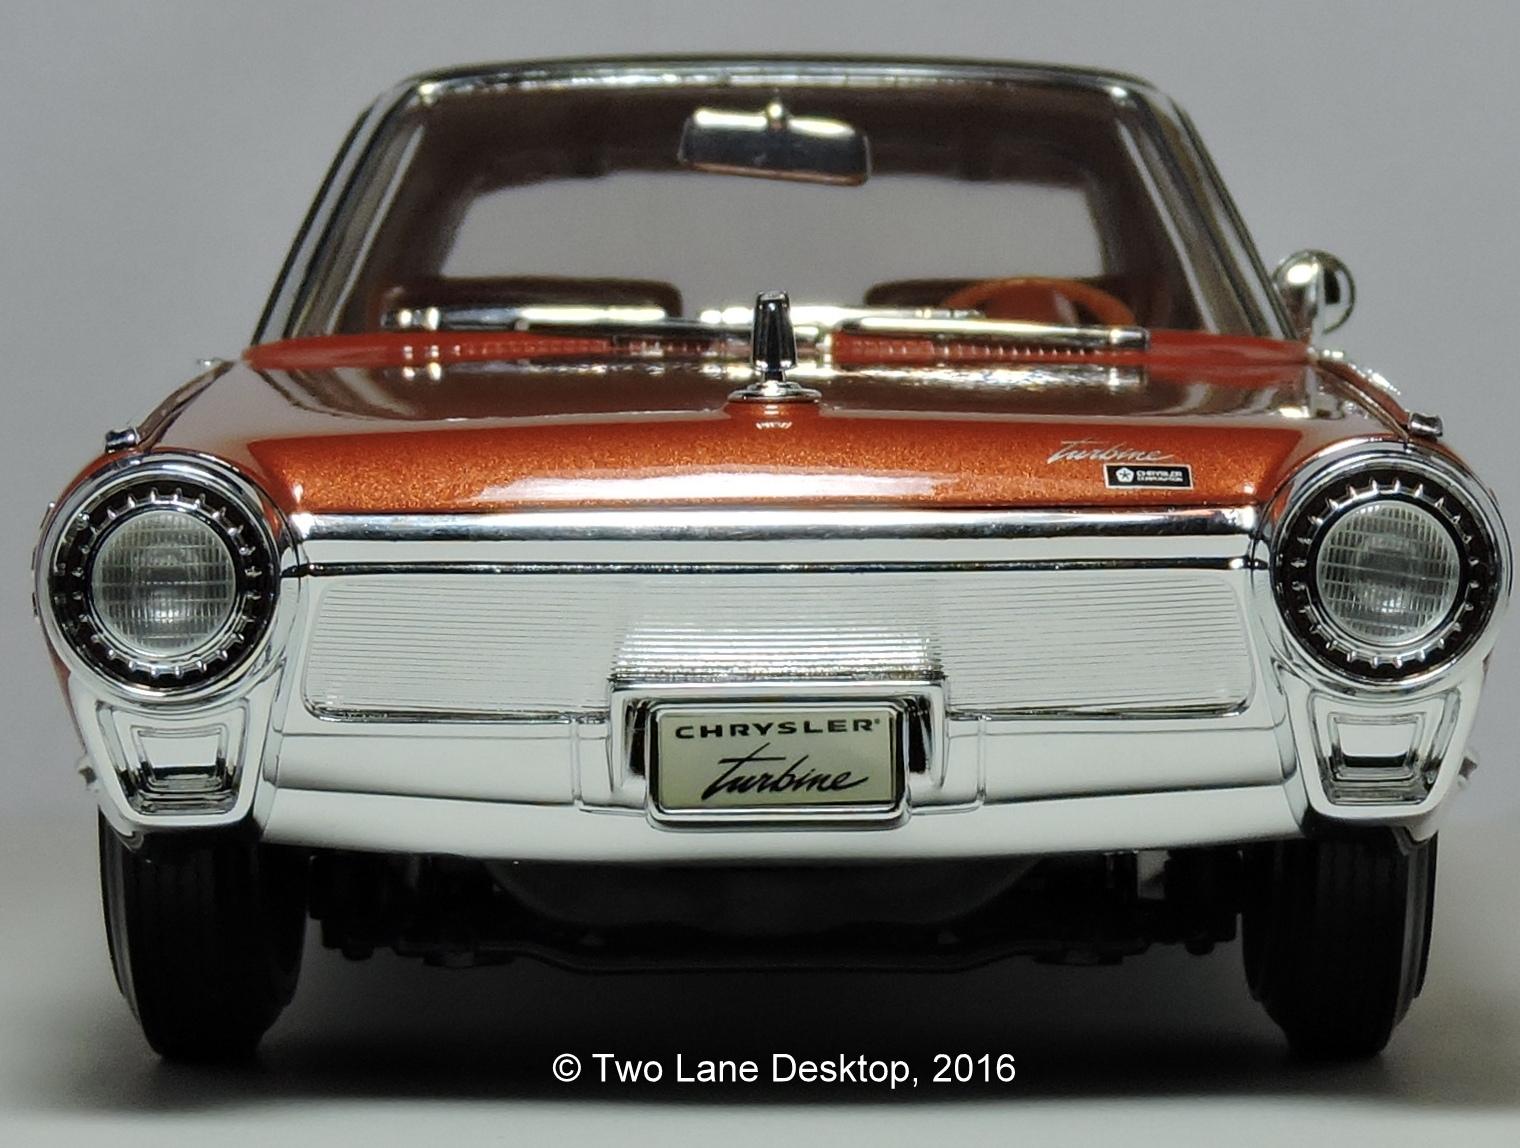 Chrysler Turbine Car: Two Lane Desktop: Yatming 1:18 1963 Chrysler Turbine Car